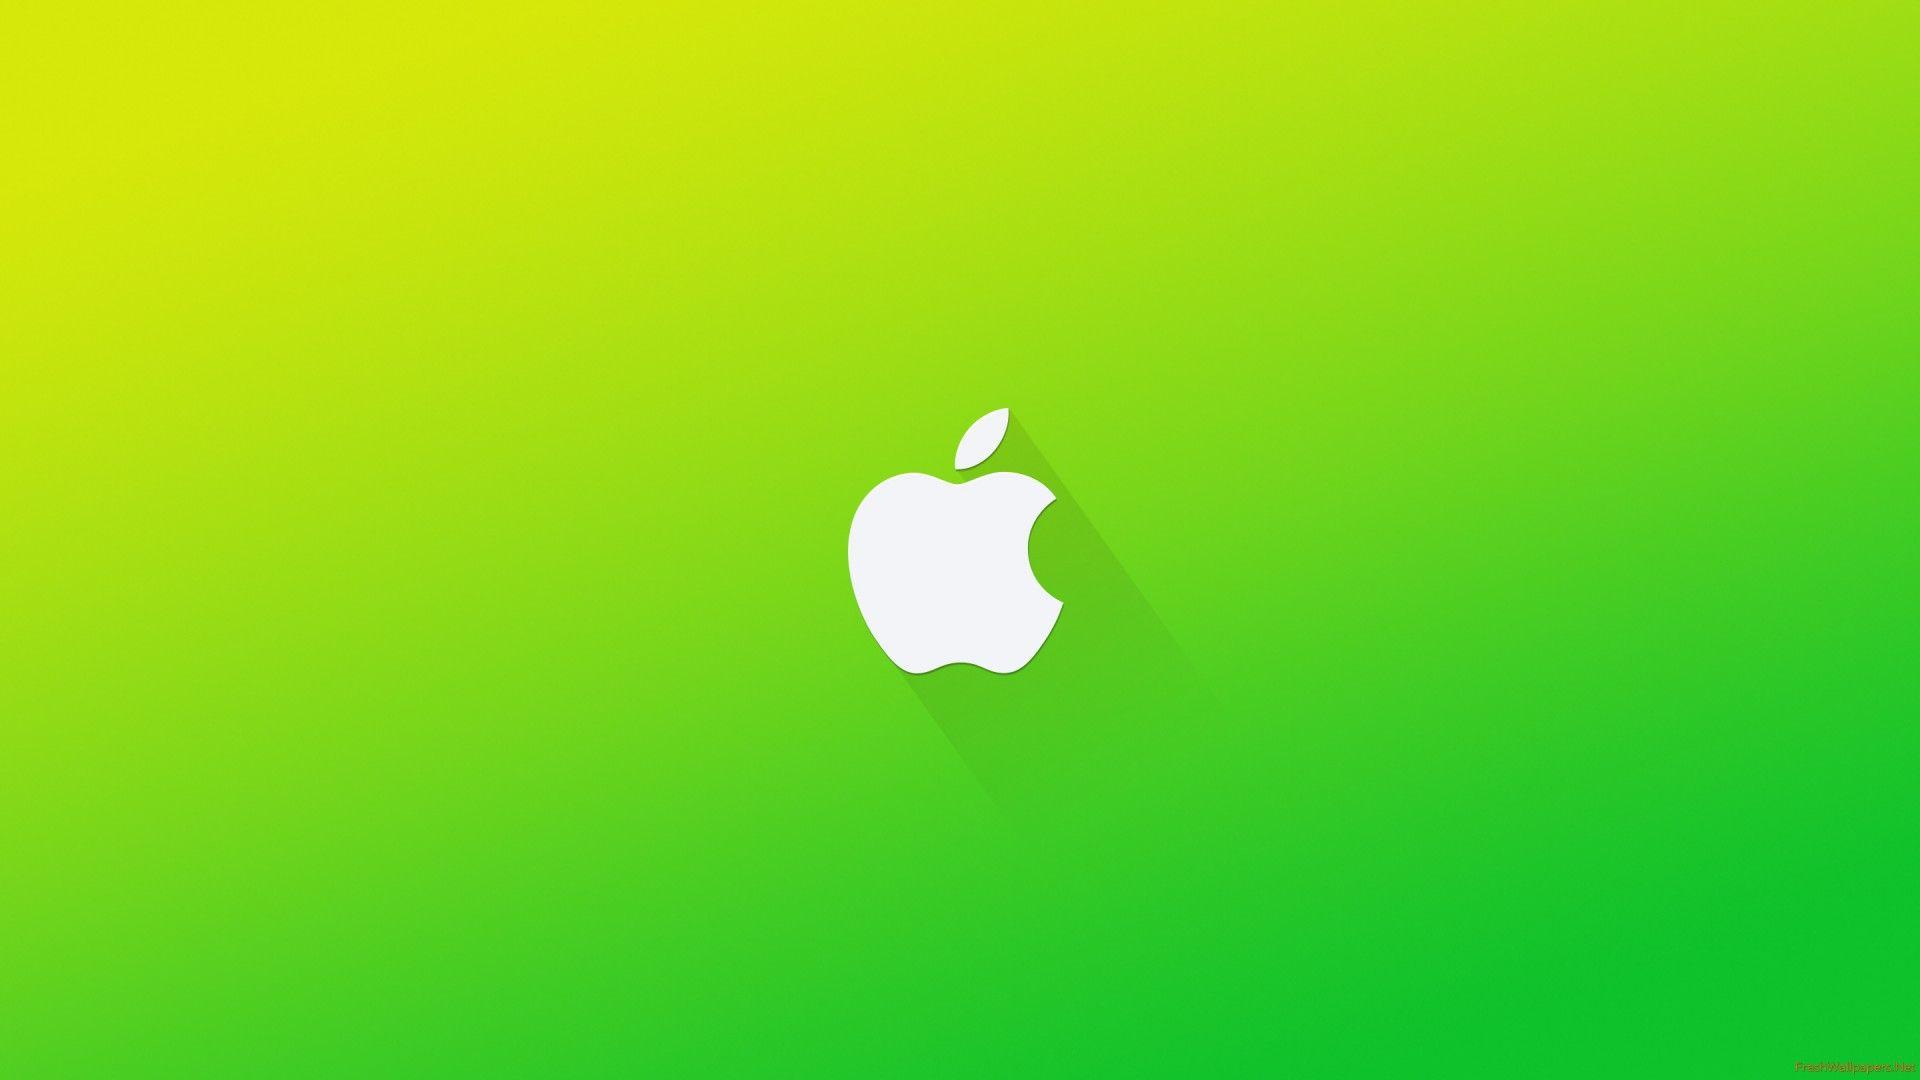 hd apple logo wallpapers hd wallpapers | hd wallpapers | pinterest